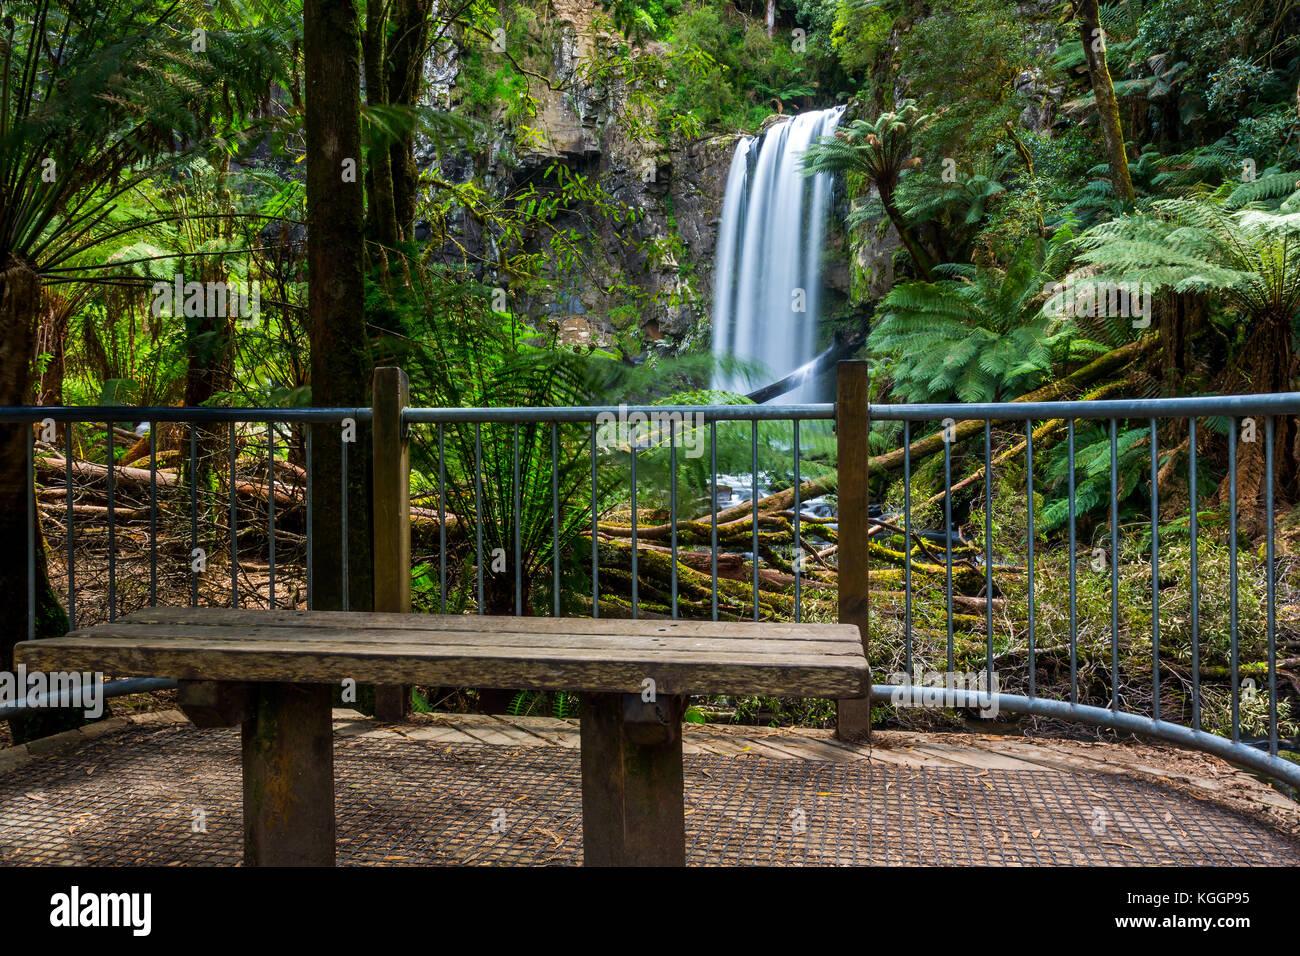 The viewing platform at the bottom of the Hopetoun Falls. - Stock Image